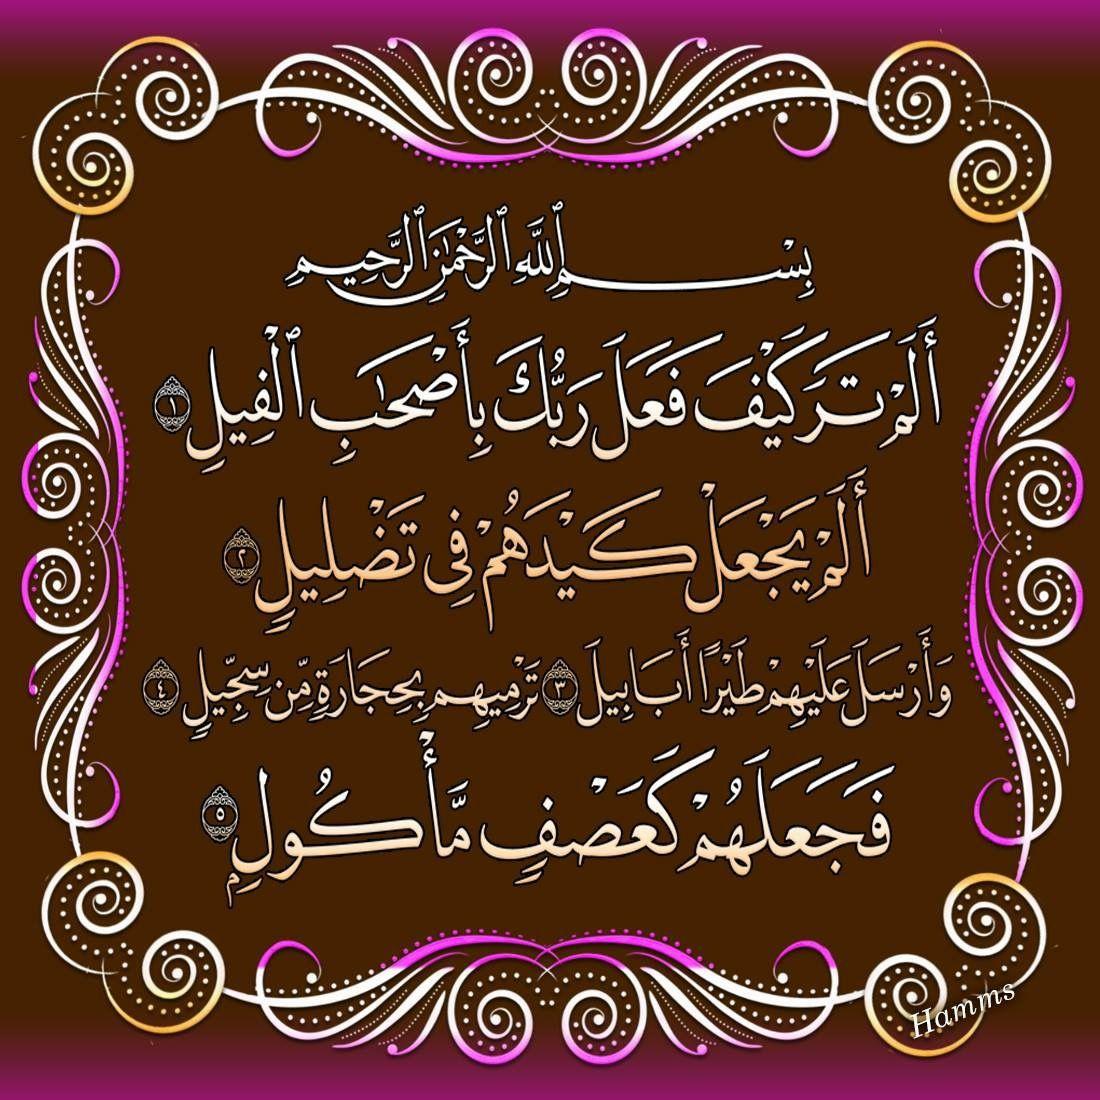 Desertrose Aayat Bayinat سورة الفيل Islamic Art Calligraphy Afghan Quotes Surah Al Quran